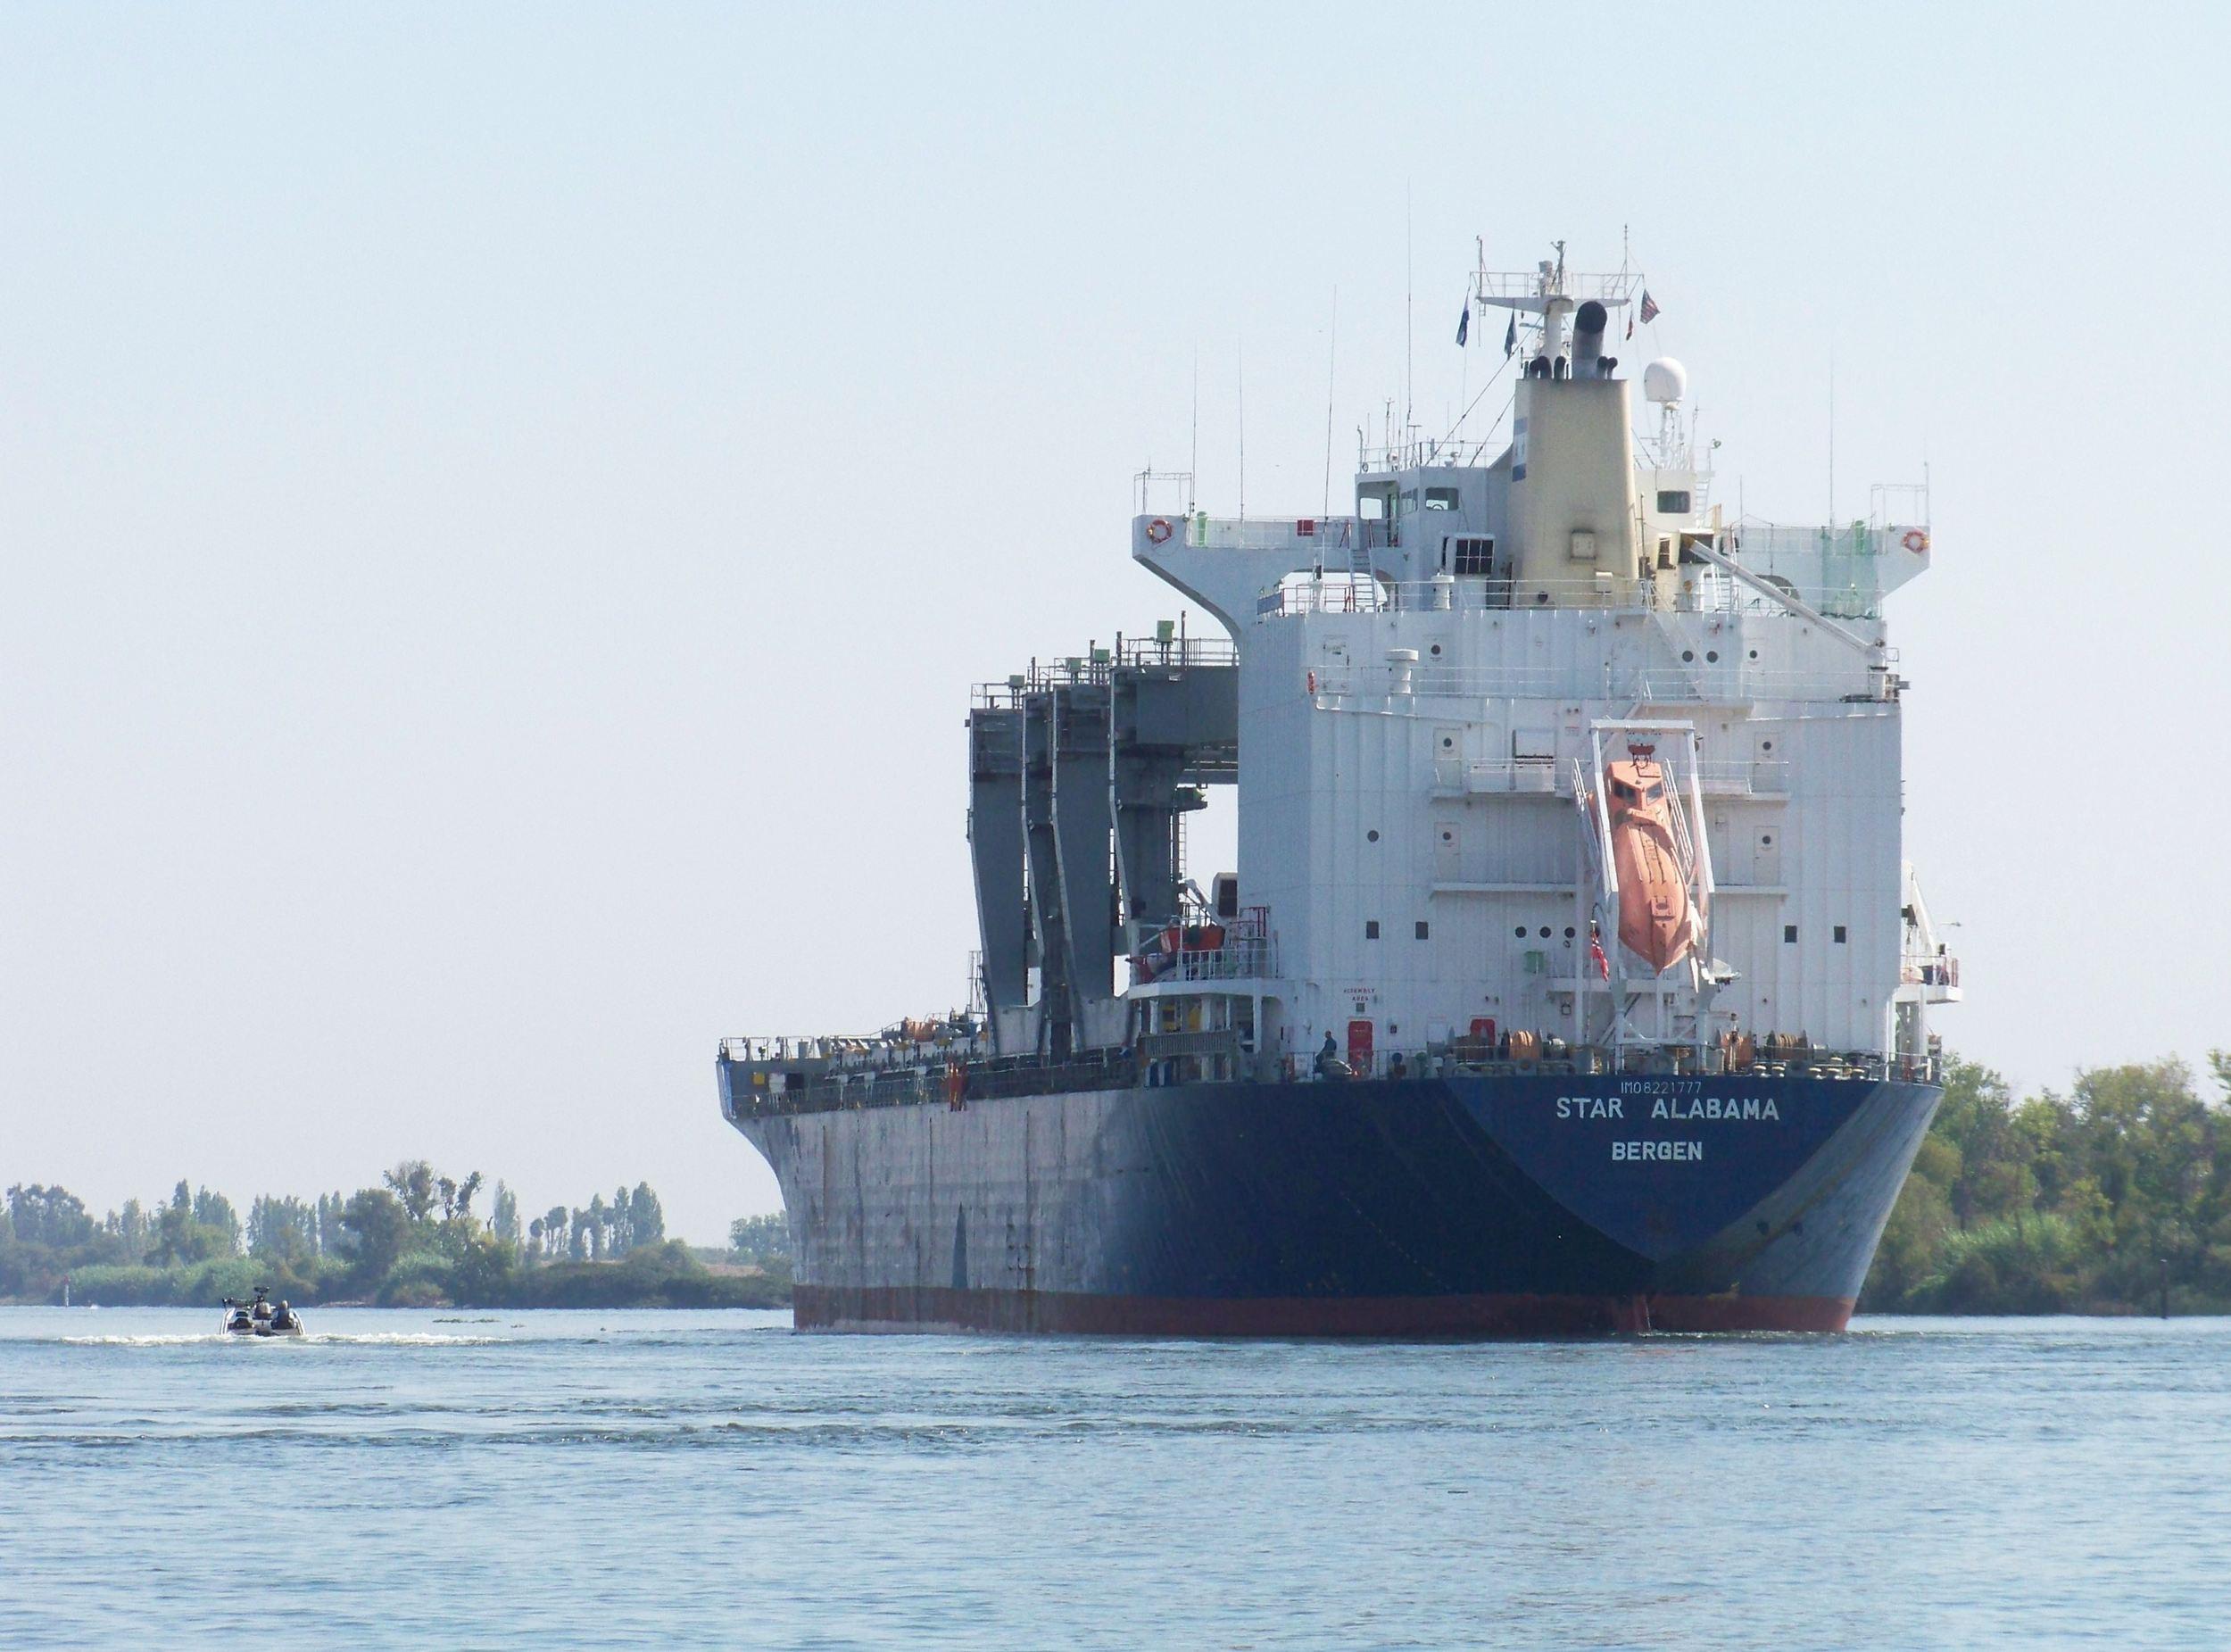 Large vessel on the San Joaquin River heading to Stockton